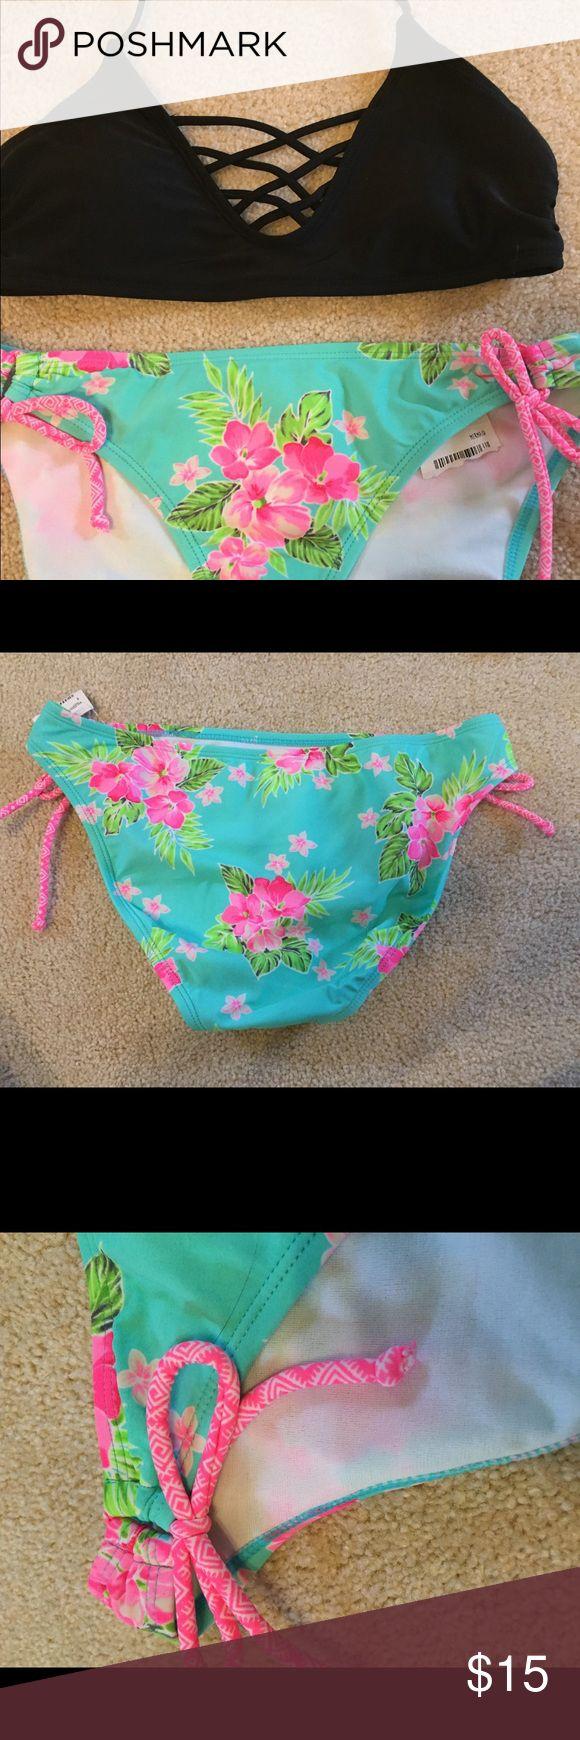 Altar'd state bikini bottoms Brand new bikini bottoms! These are so fun and …